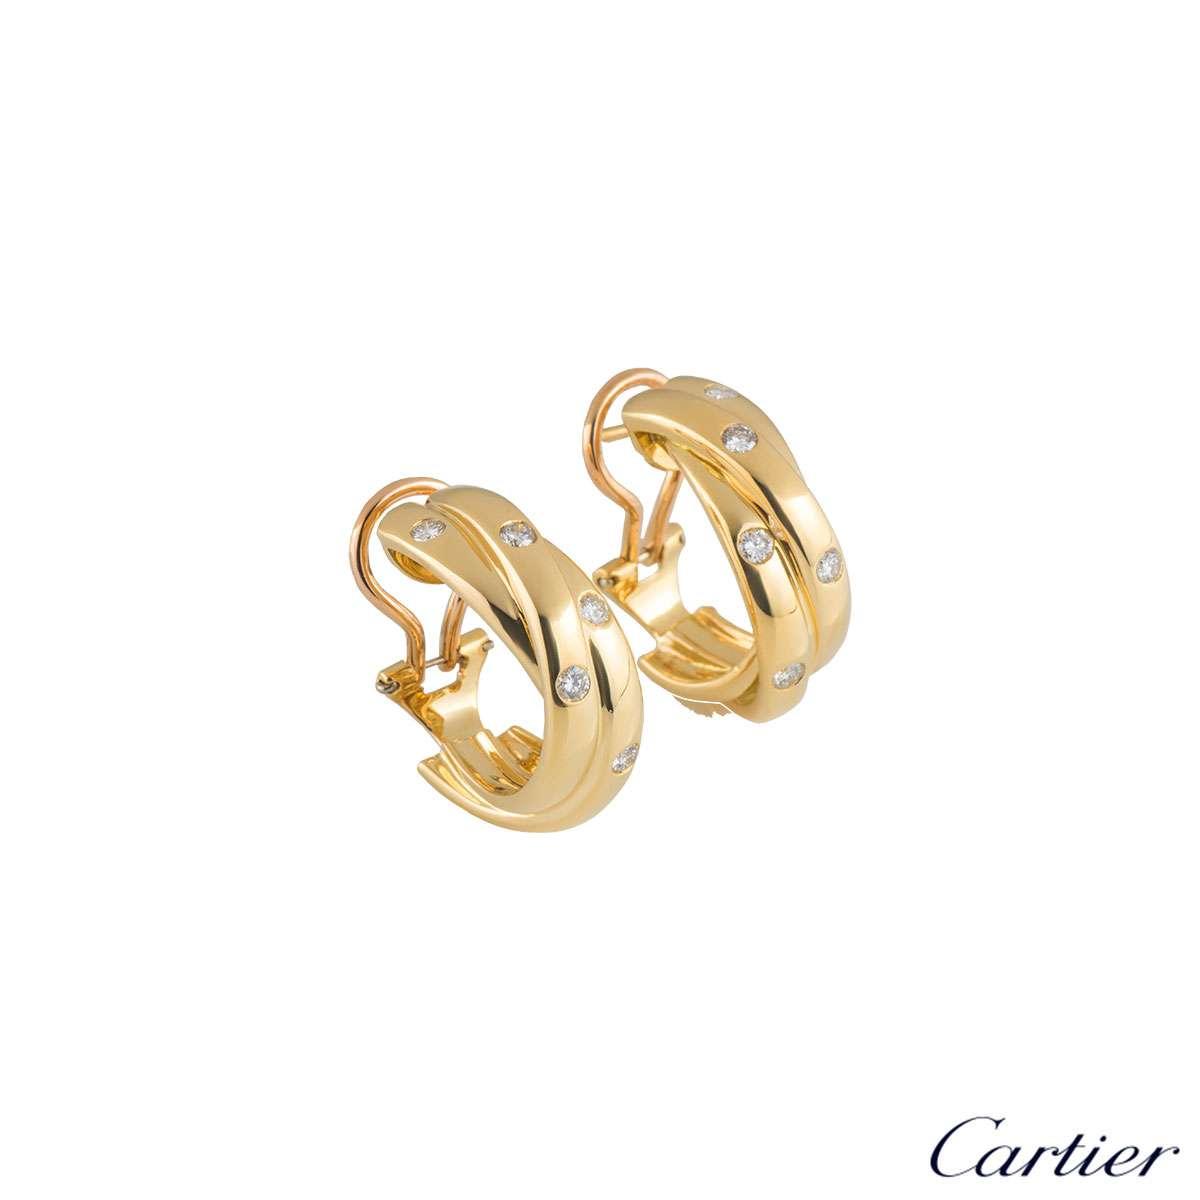 Cartier Yellow Gold Diamond Trinity de Cartier Hoop Earrings